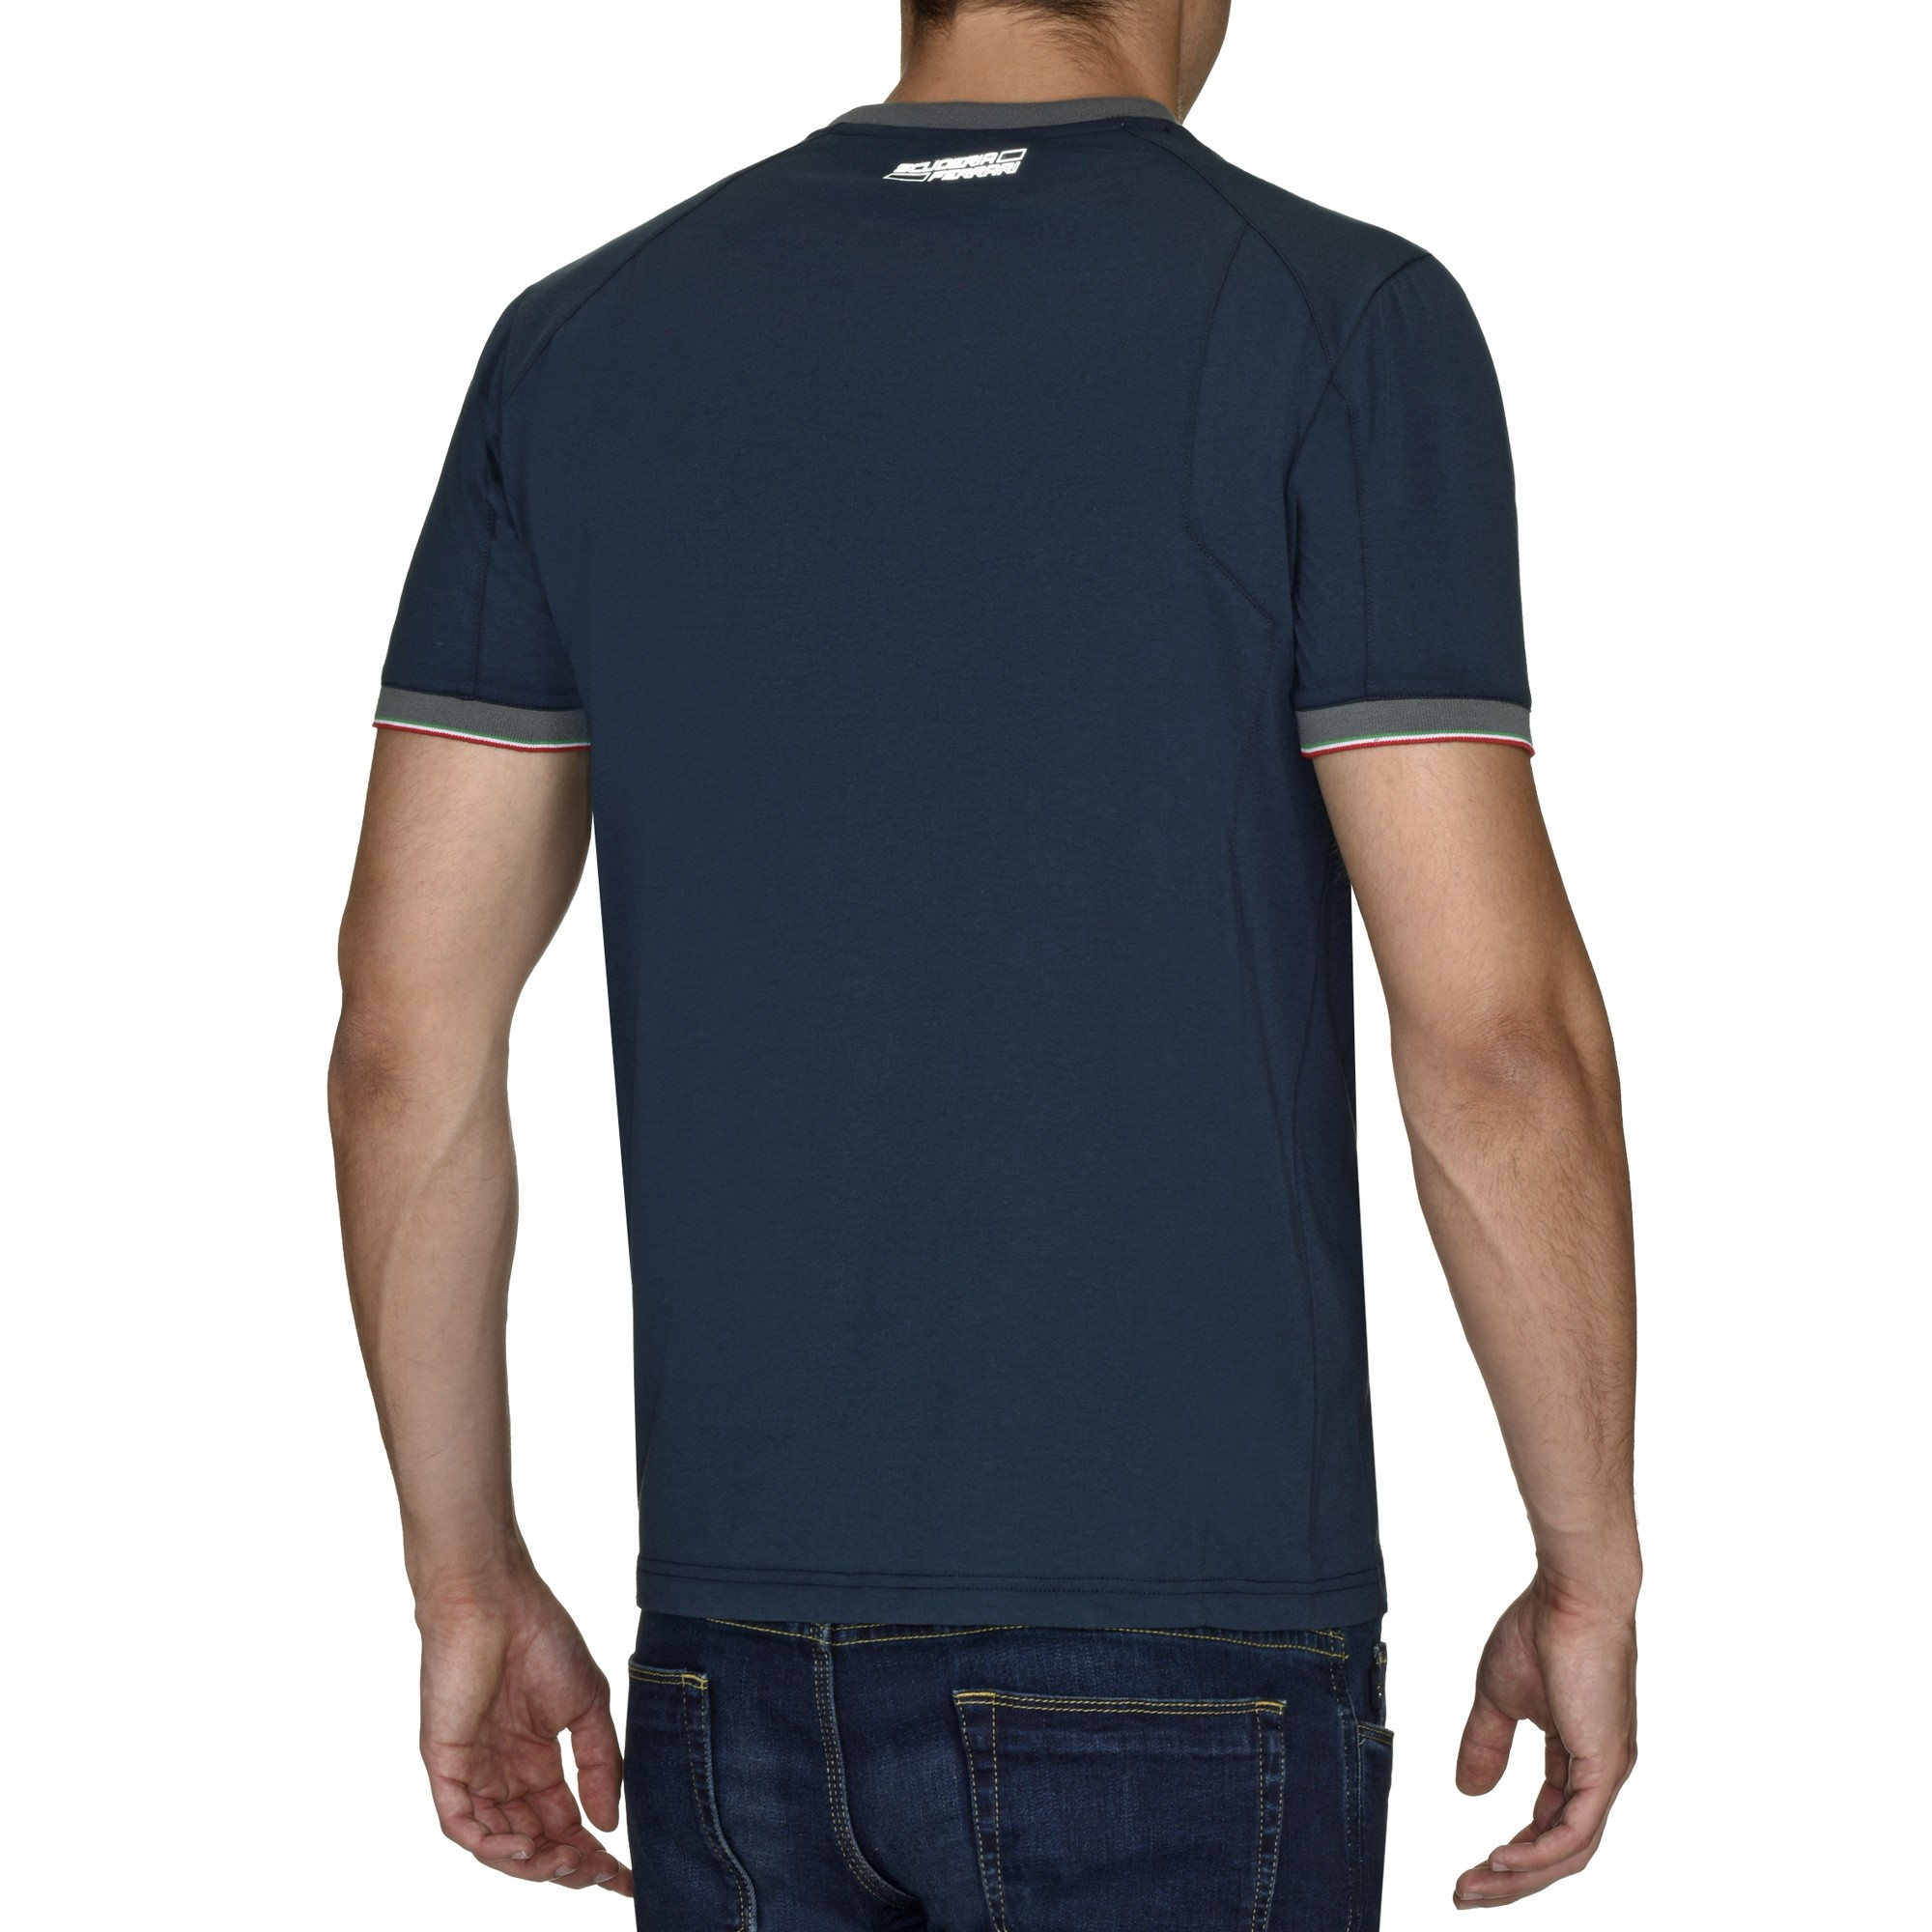 logo tee supreme shirt t fashionreps color r imgur ferrari any